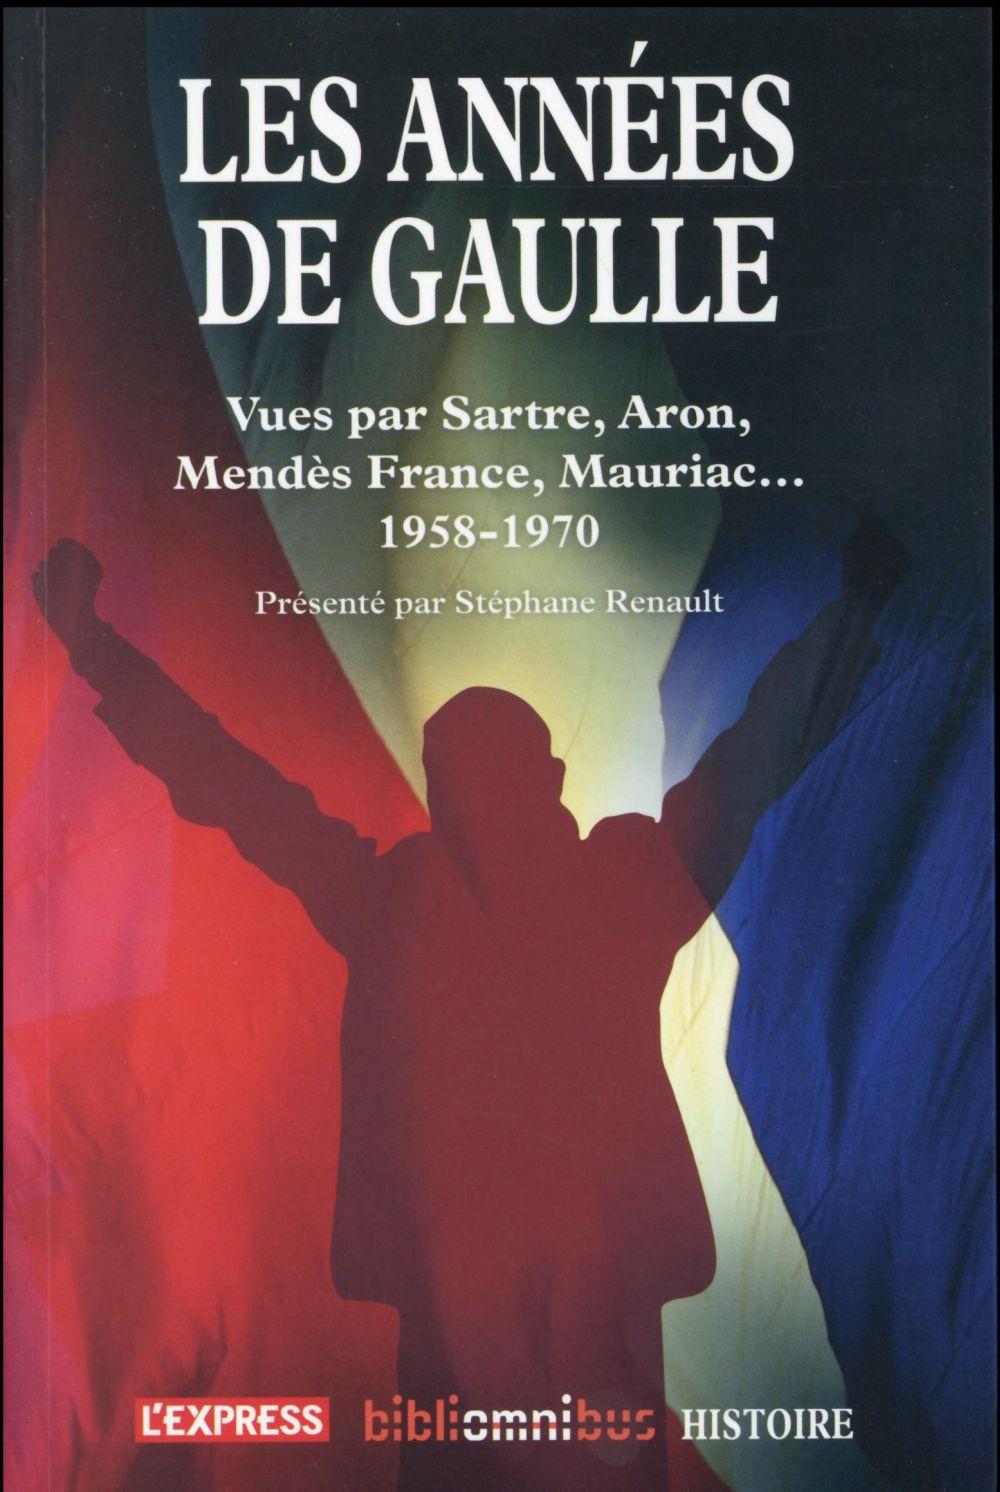 RENAULT, STEPHANE - LES ANNEES DE GAULLE  - 1958-1970